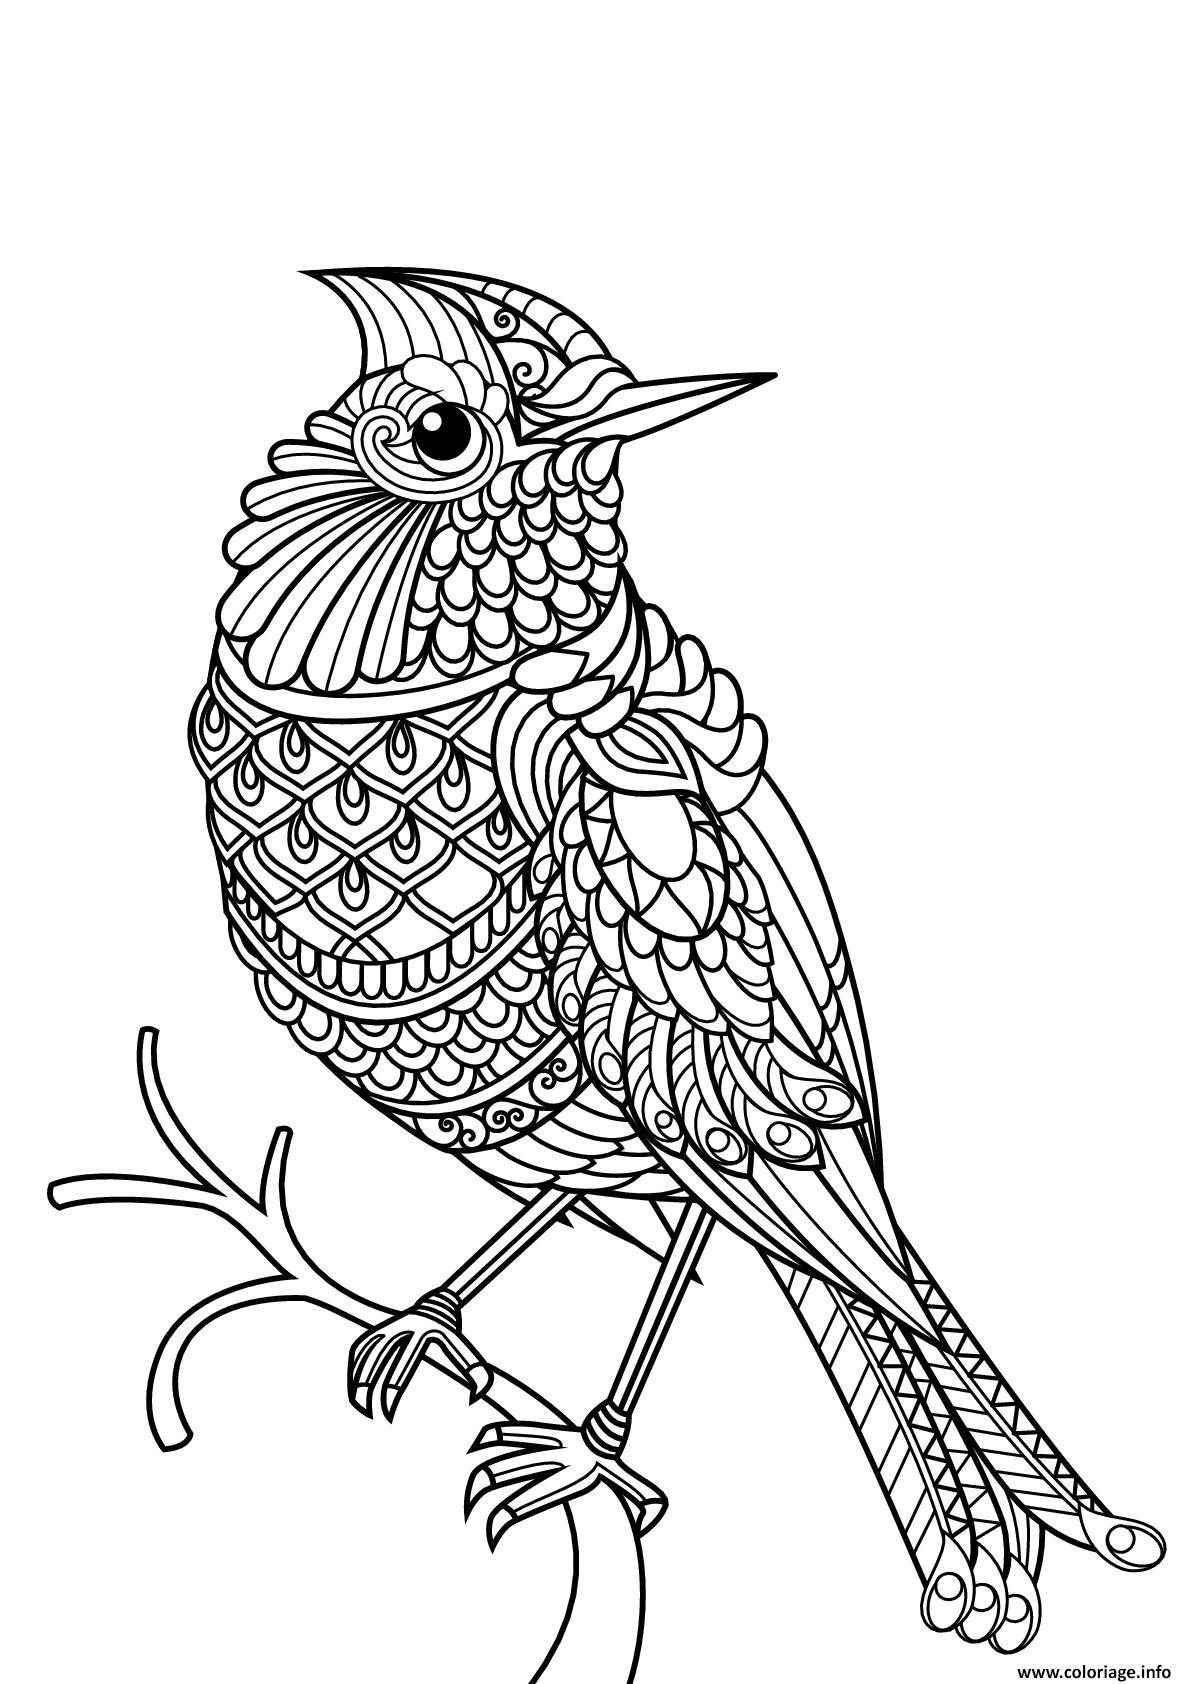 Dessin oiseau difficile adulte mandala Coloriage Gratuit à Imprimer